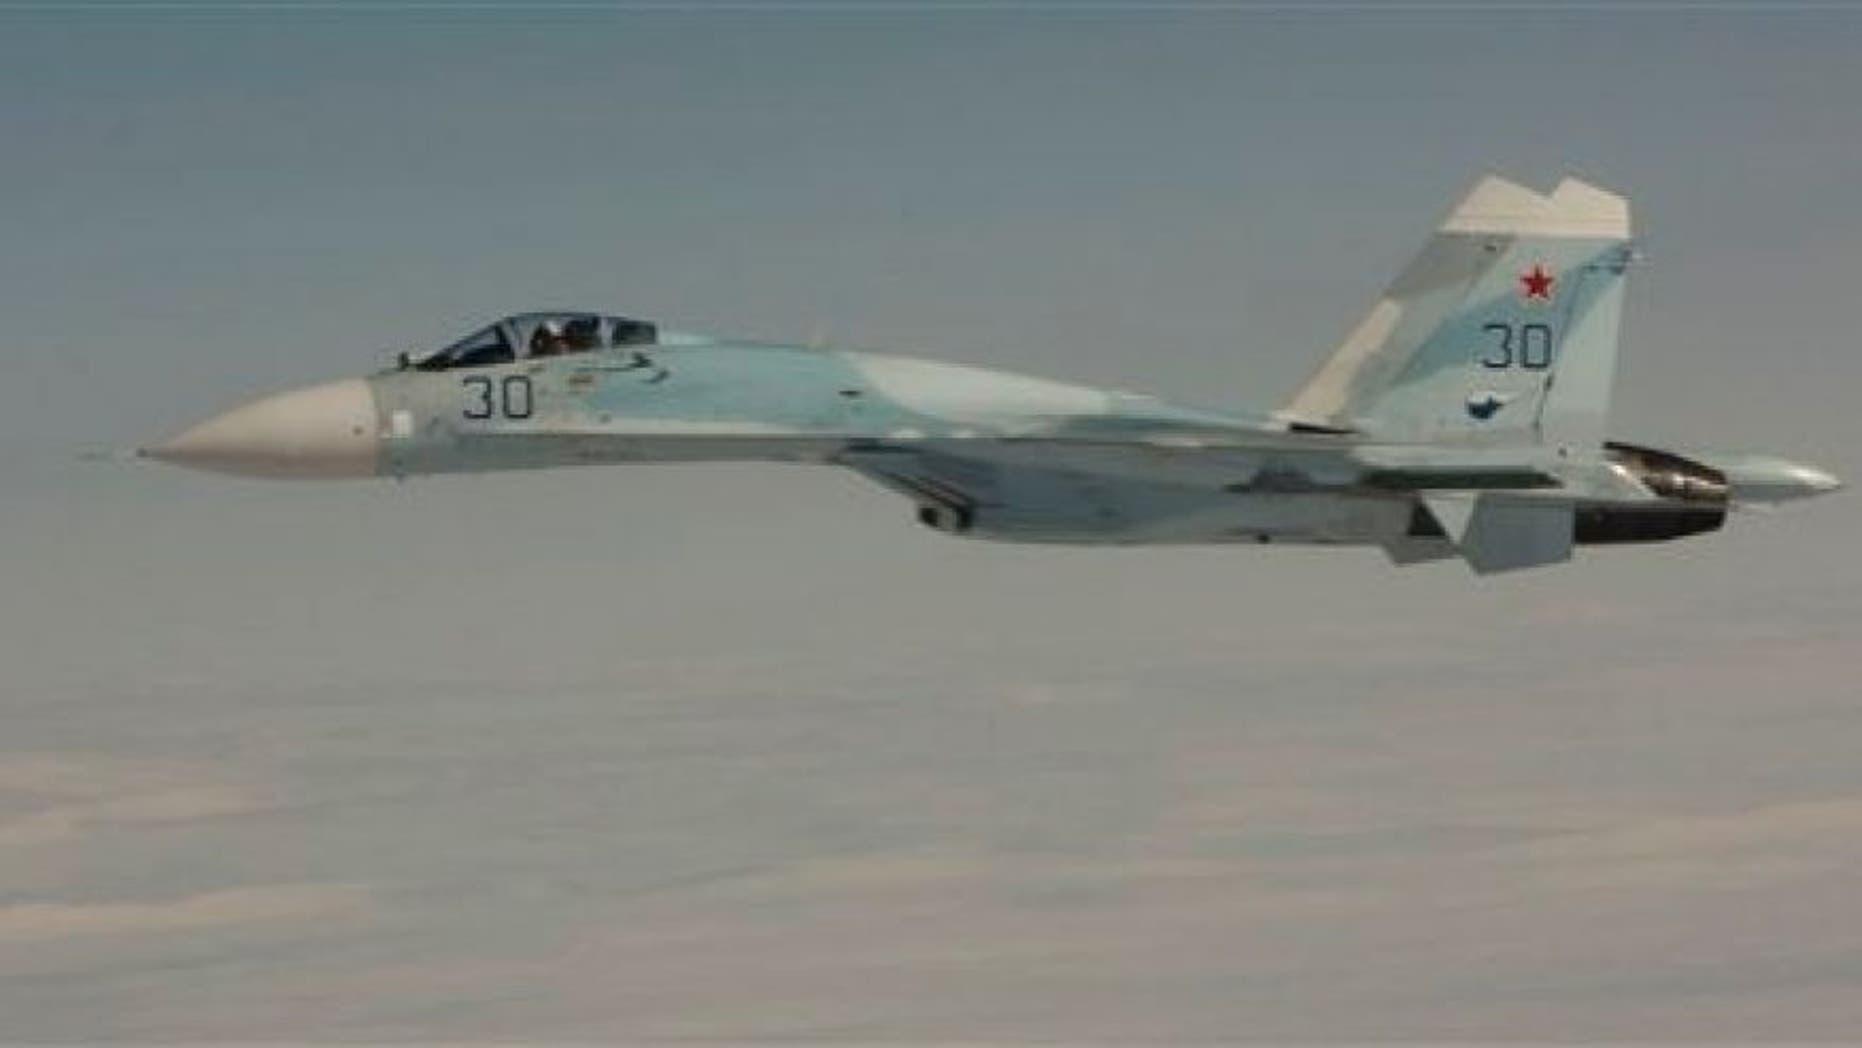 A Russian Su-27 fighter jet in 2010.